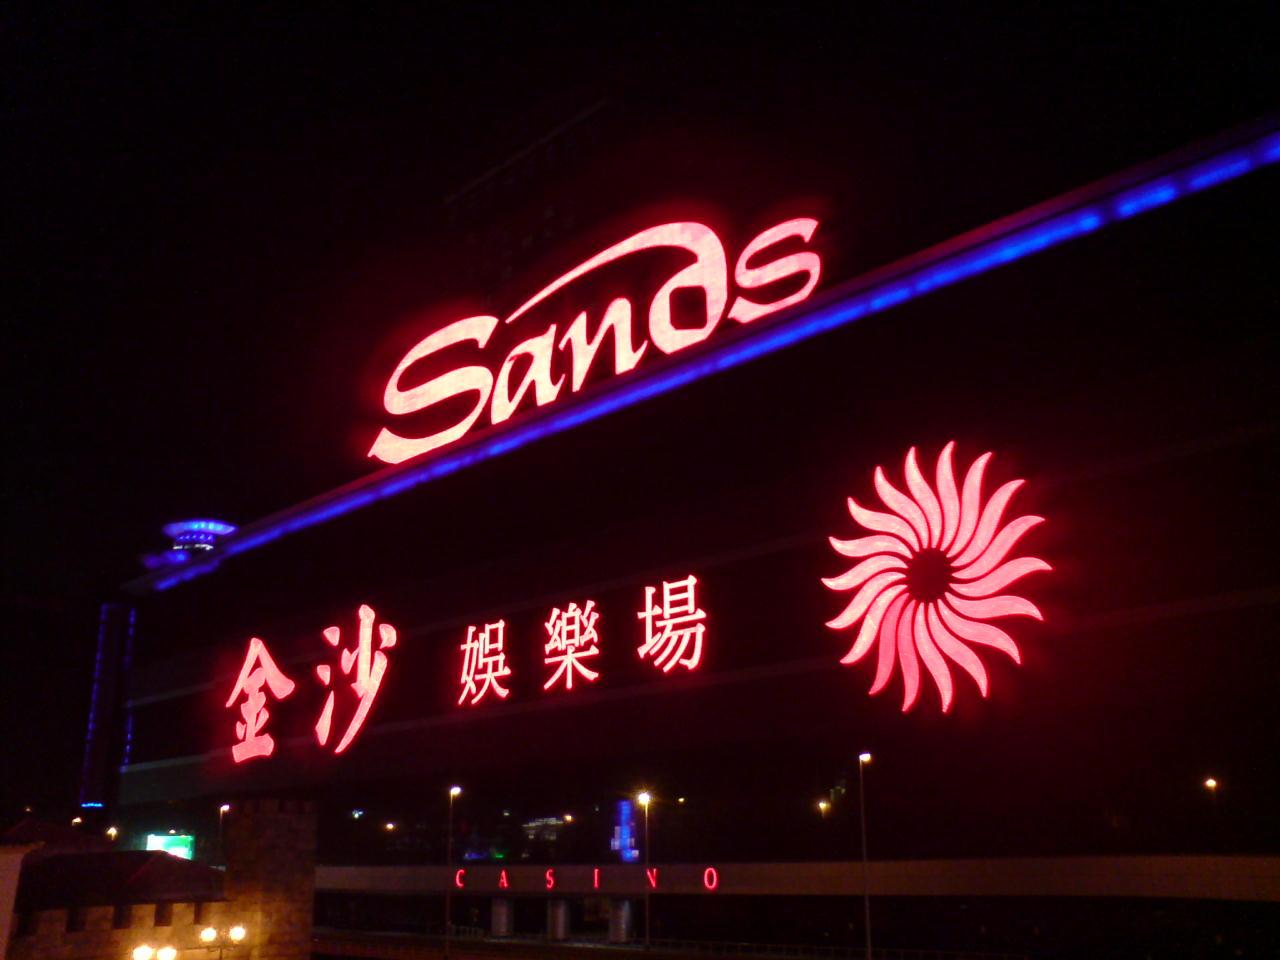 澳門金沙賭場(Kennyieong@Wikipedia / CC BY-SA 3.0)